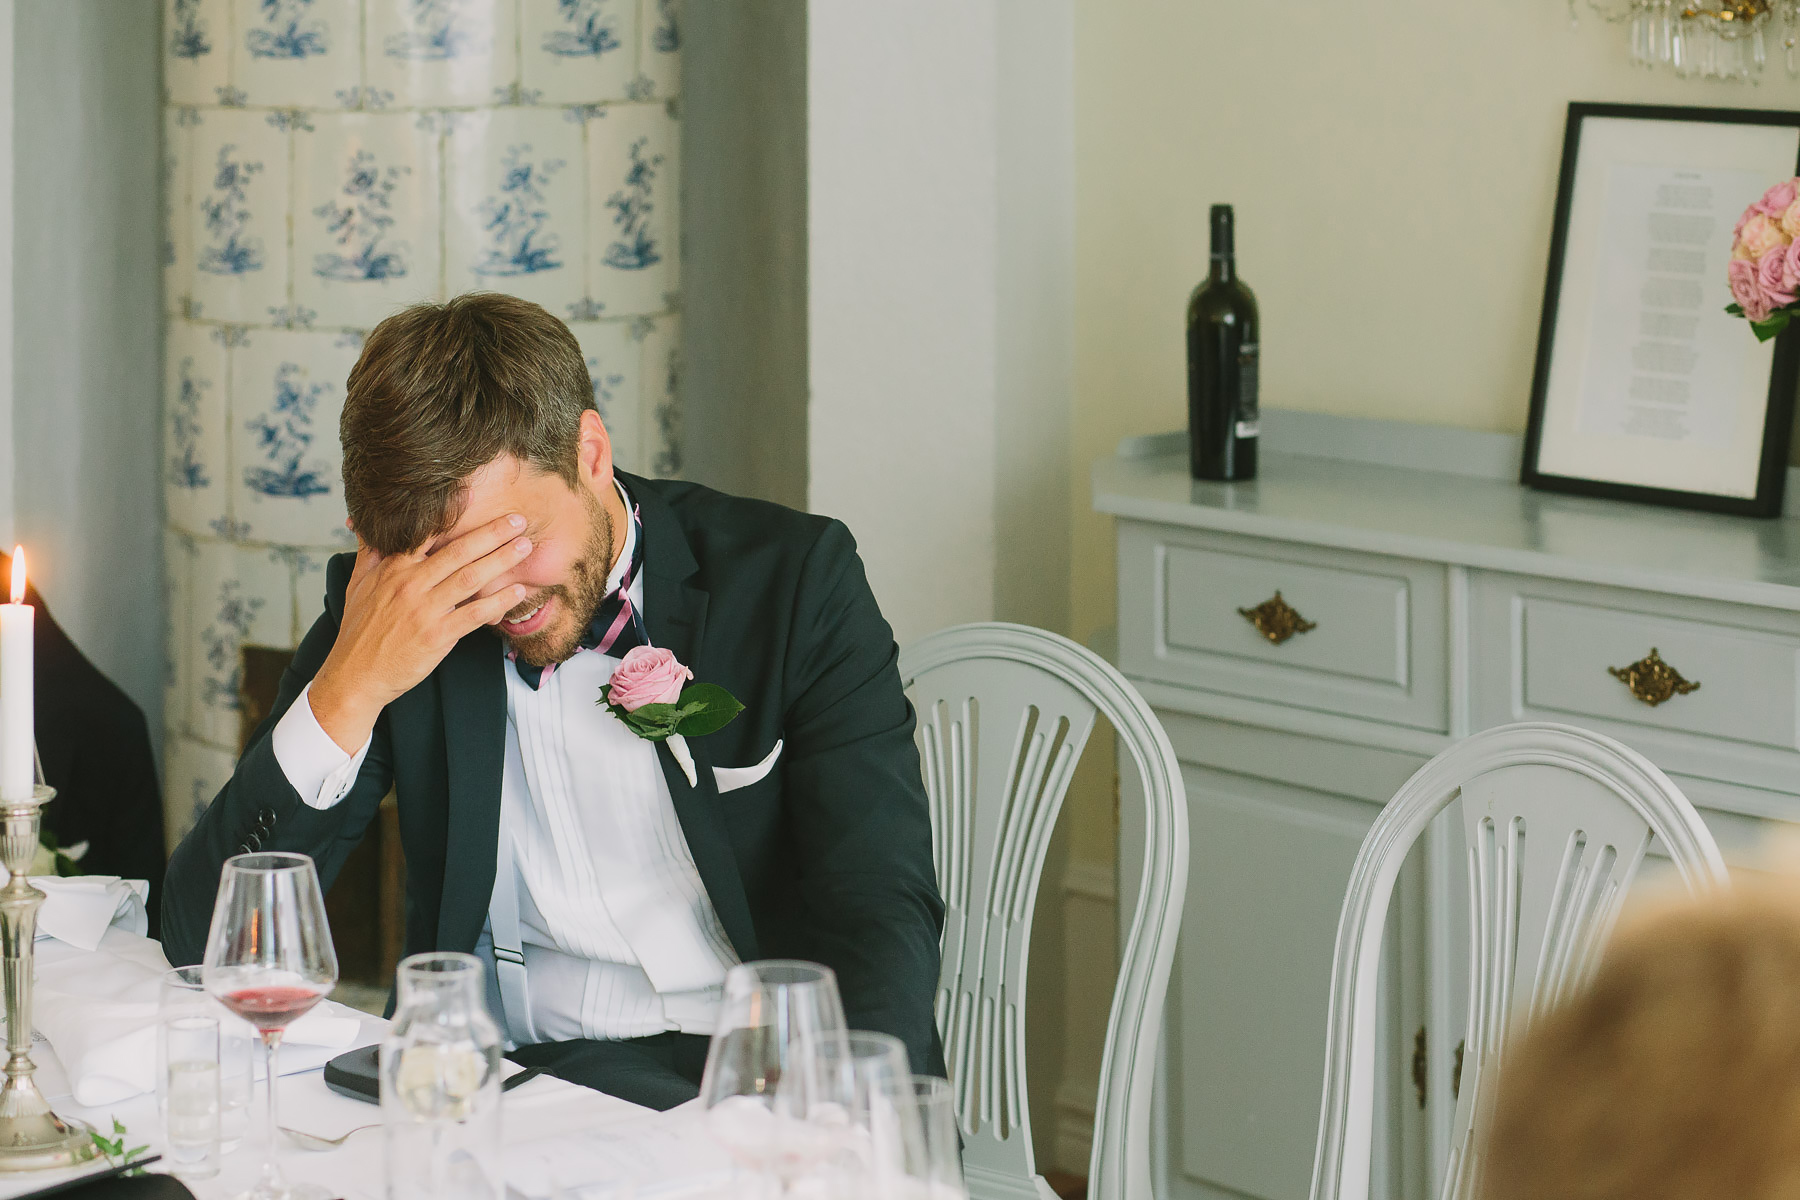 Brudgummen skäms